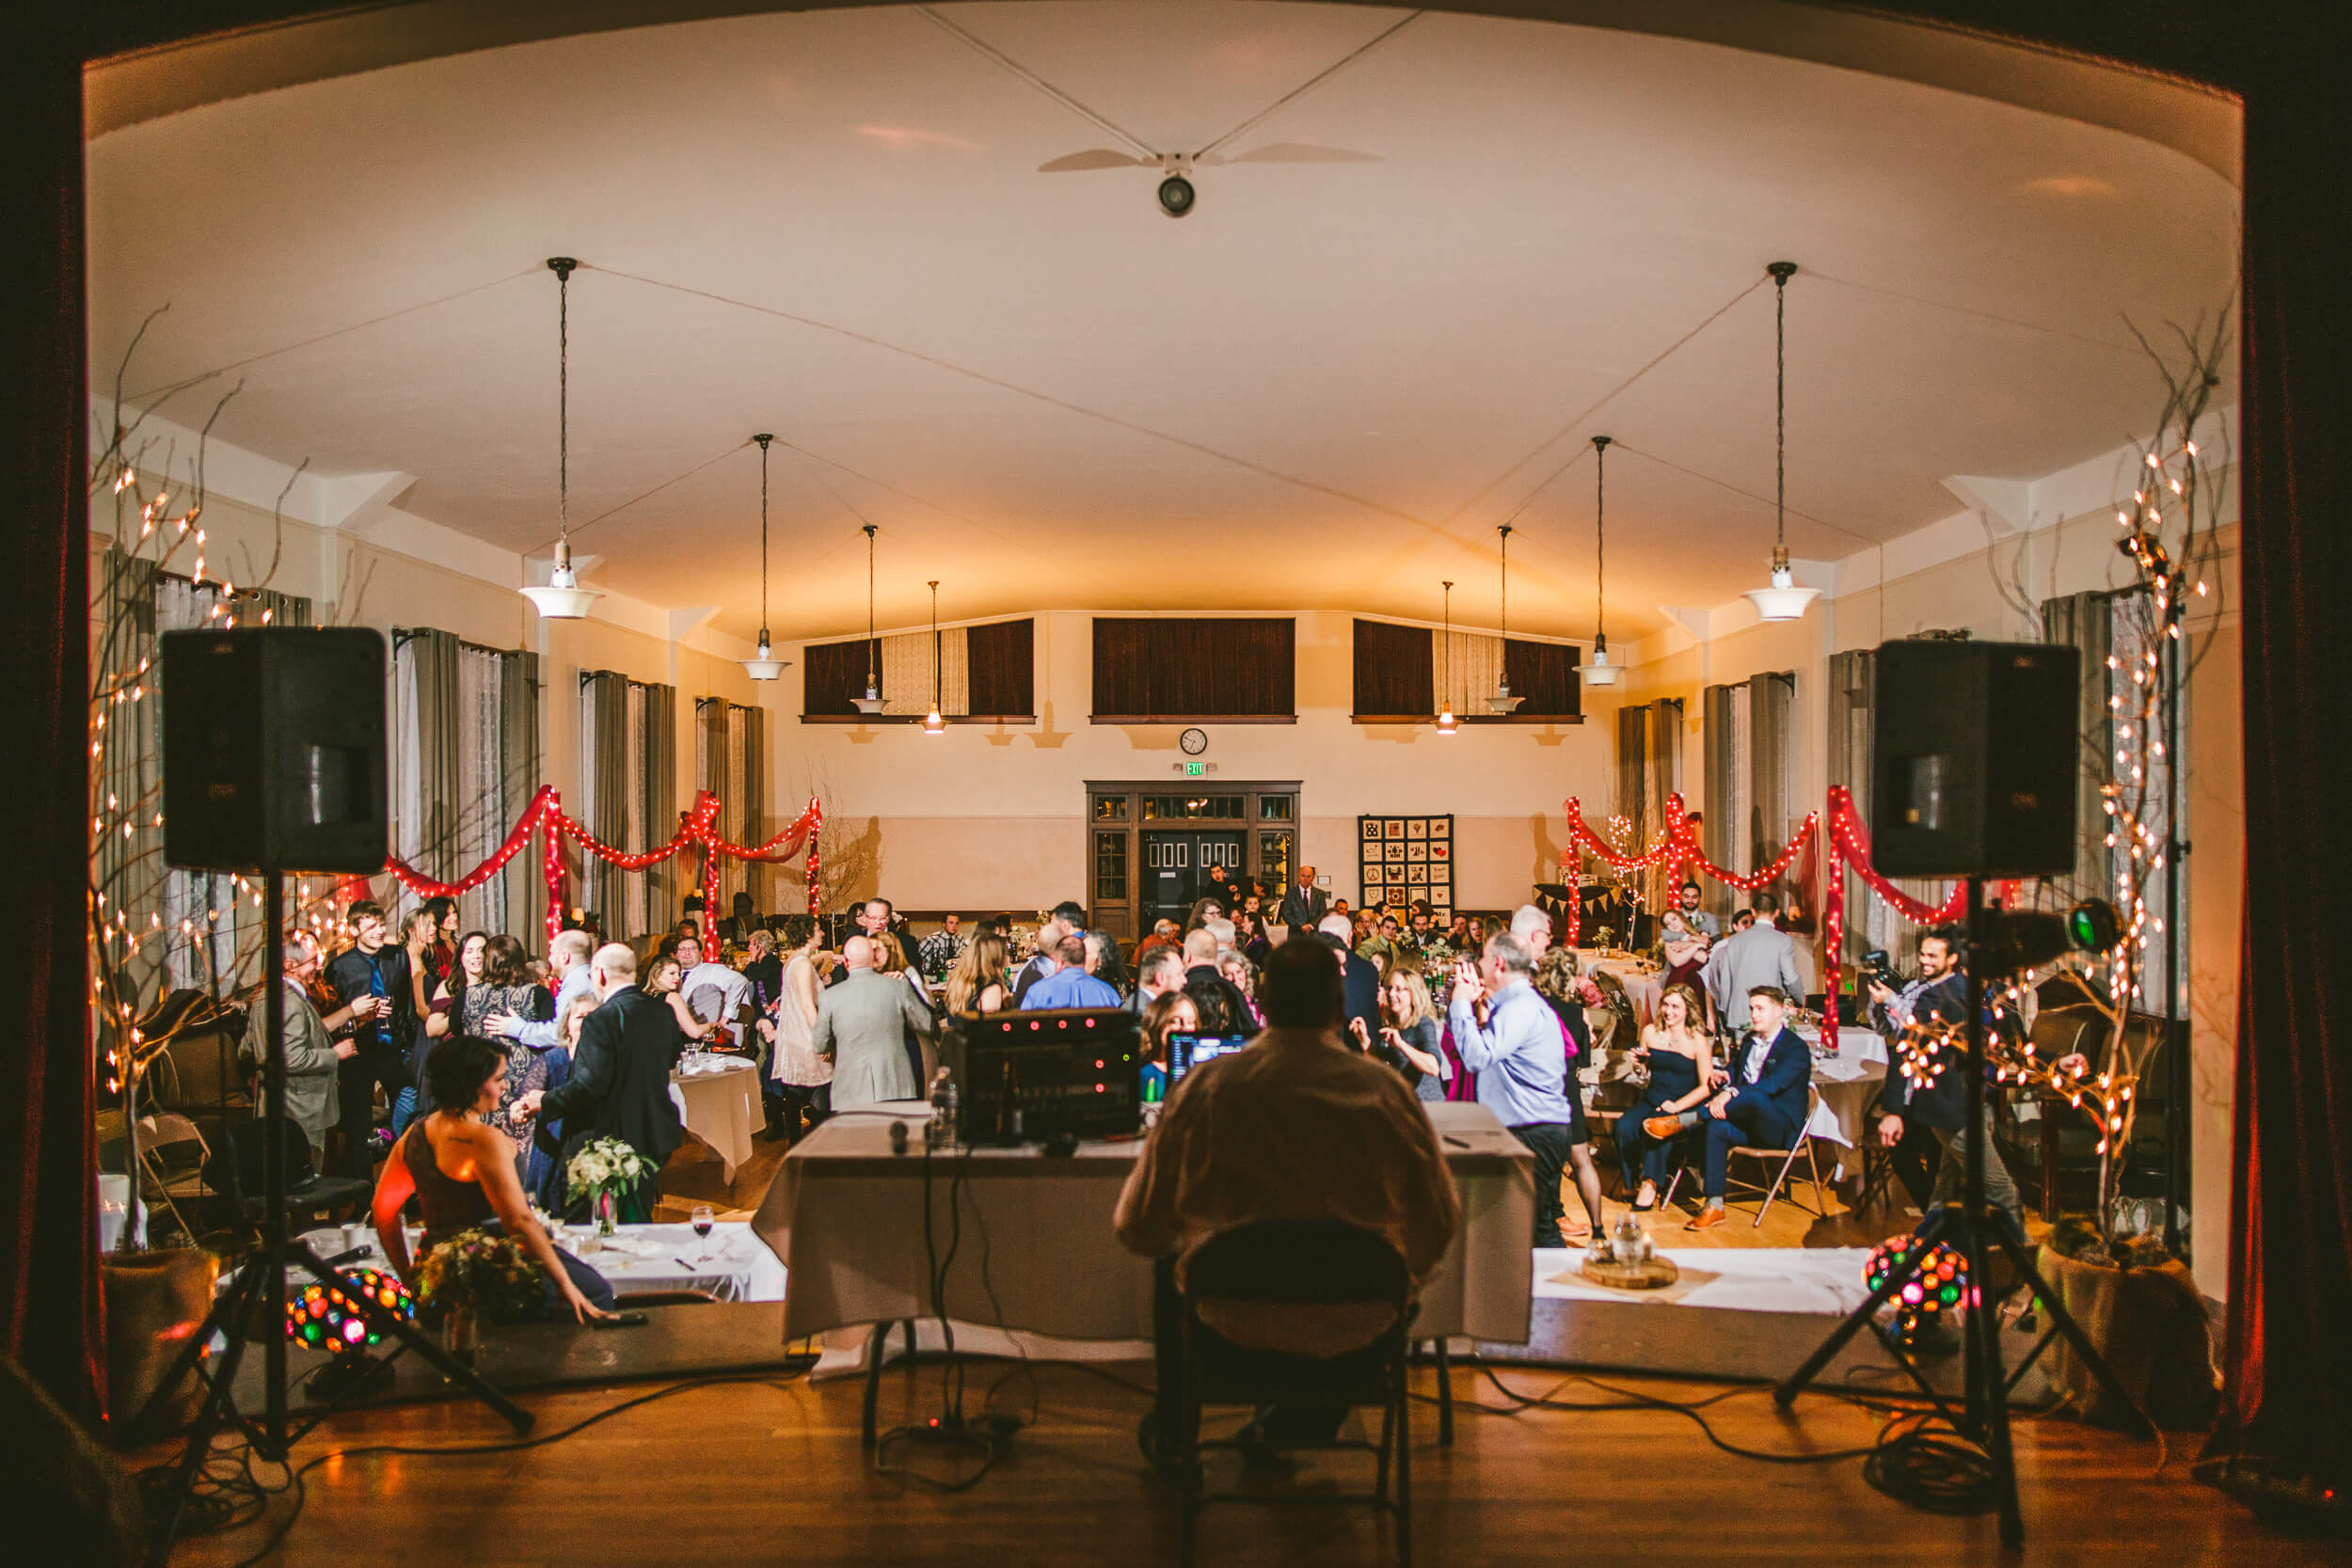 mukogawa winter wedding in spokane (300).jpg